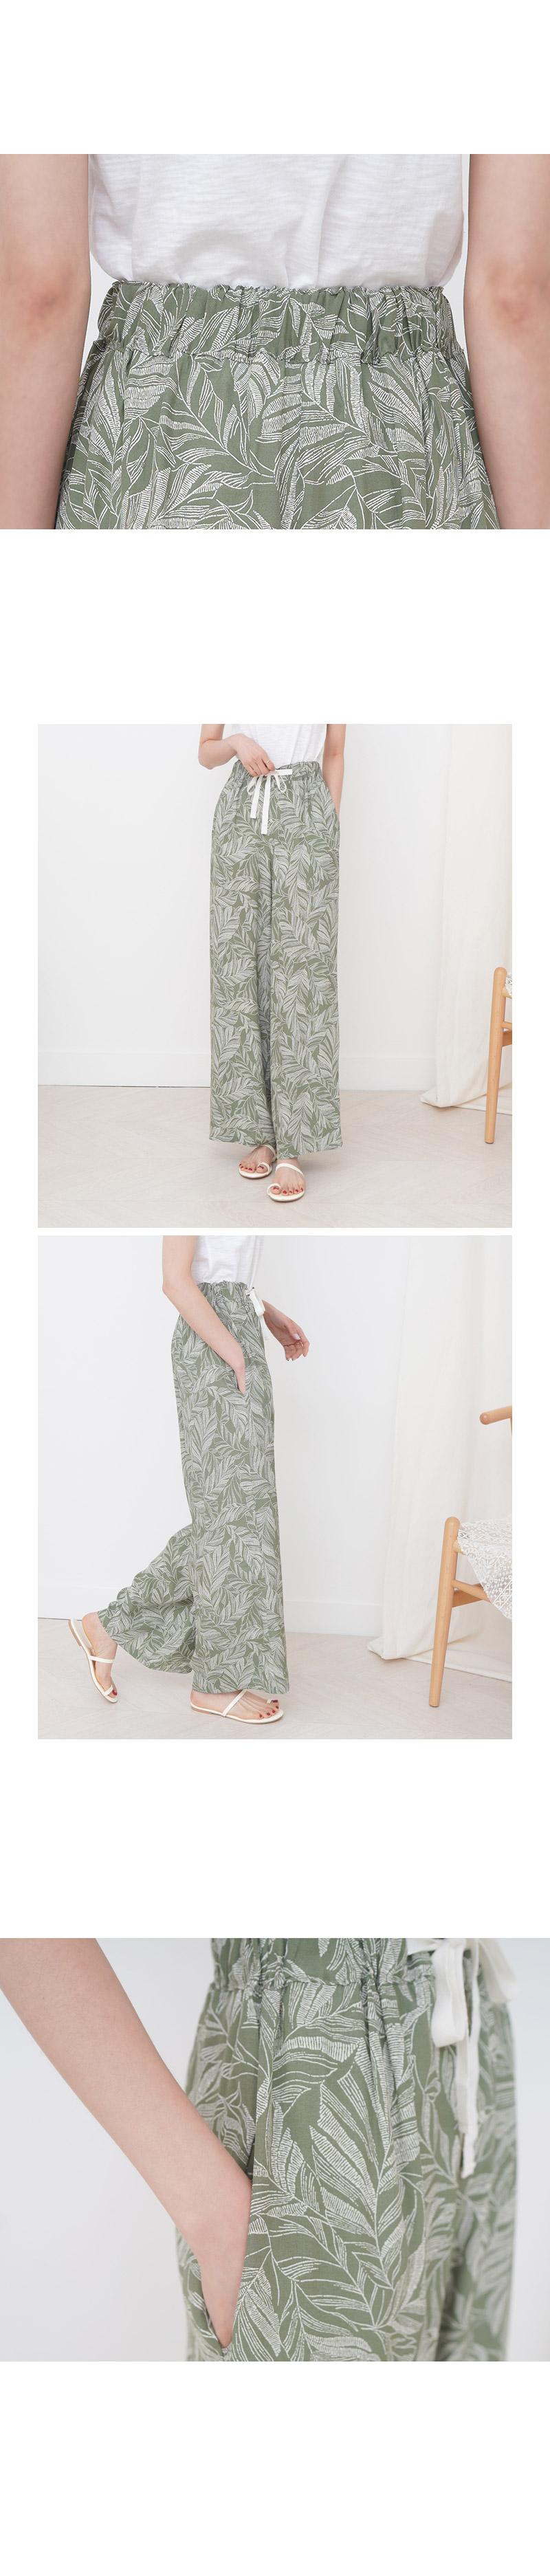 Summer Pattern Charming Banding Slacks